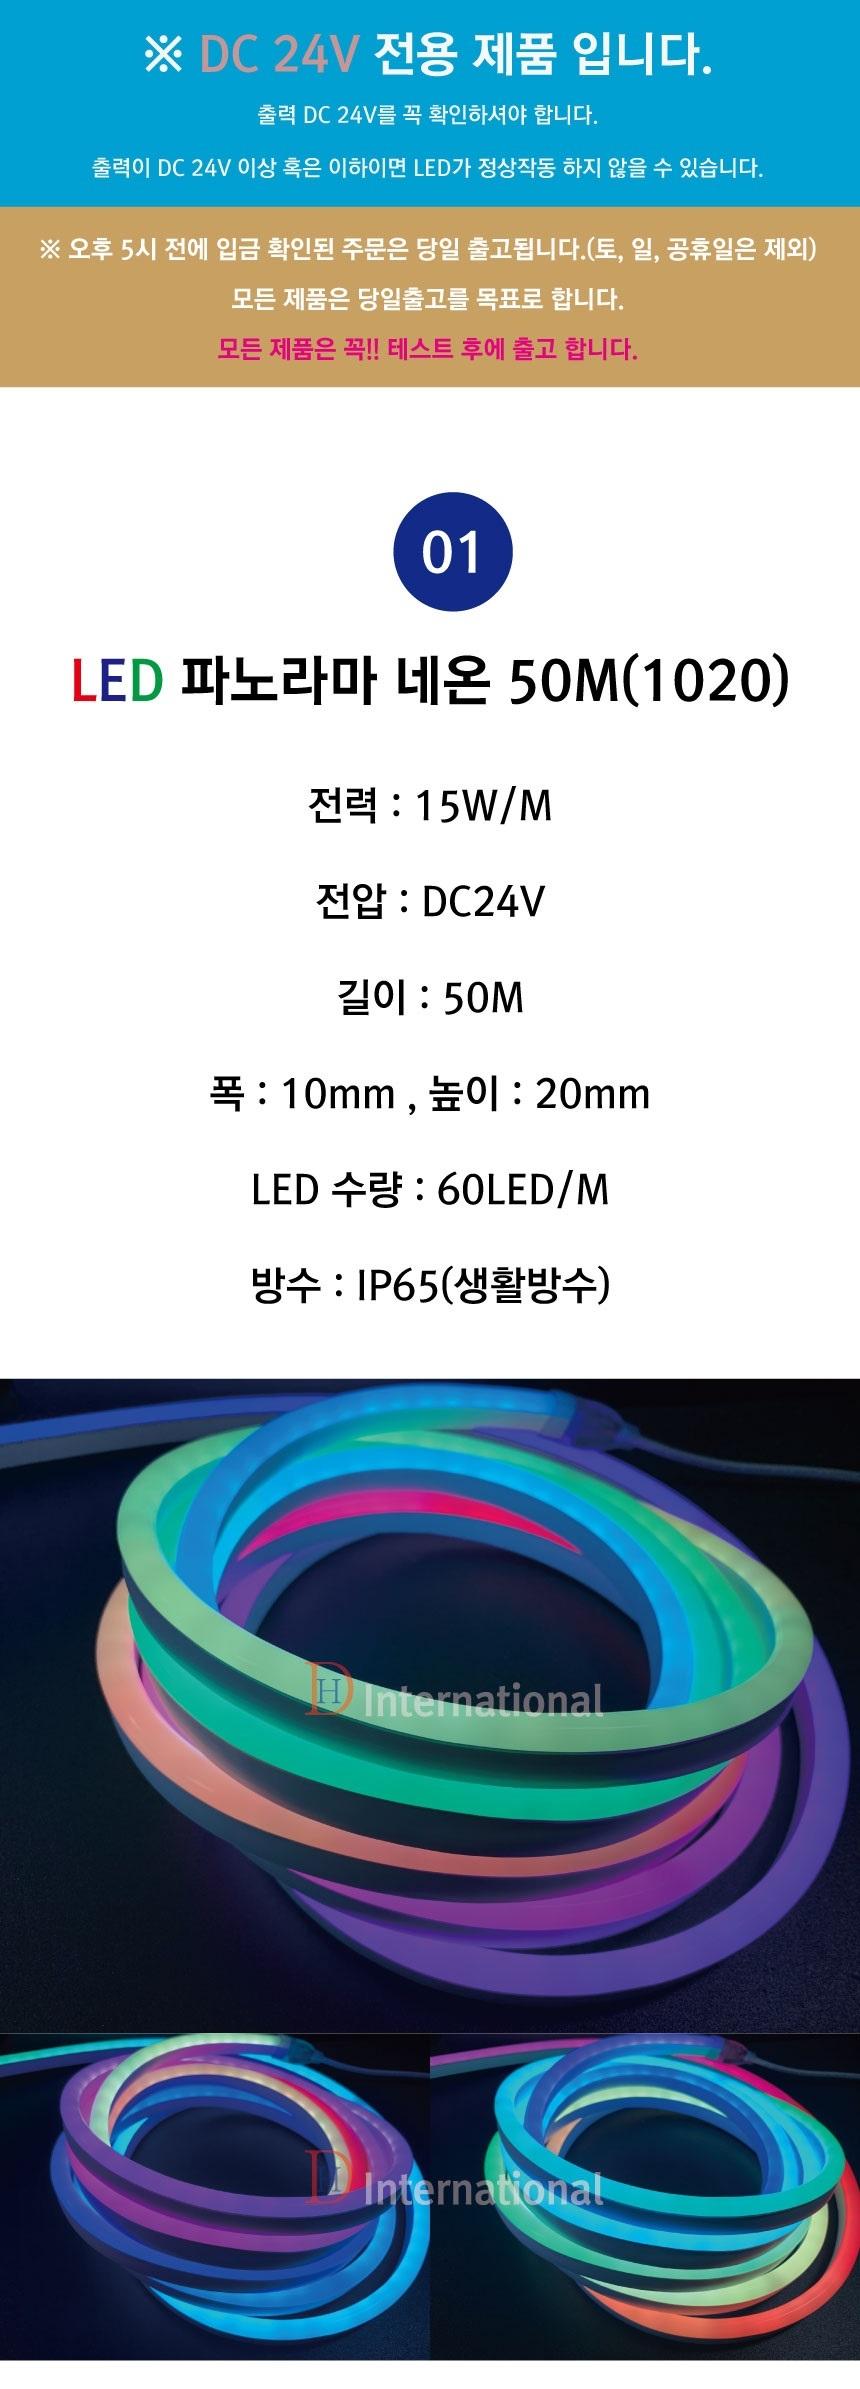 DC24V-50M-%ED%8C%8C%EB%85%B8%EB%9D%BC%EB